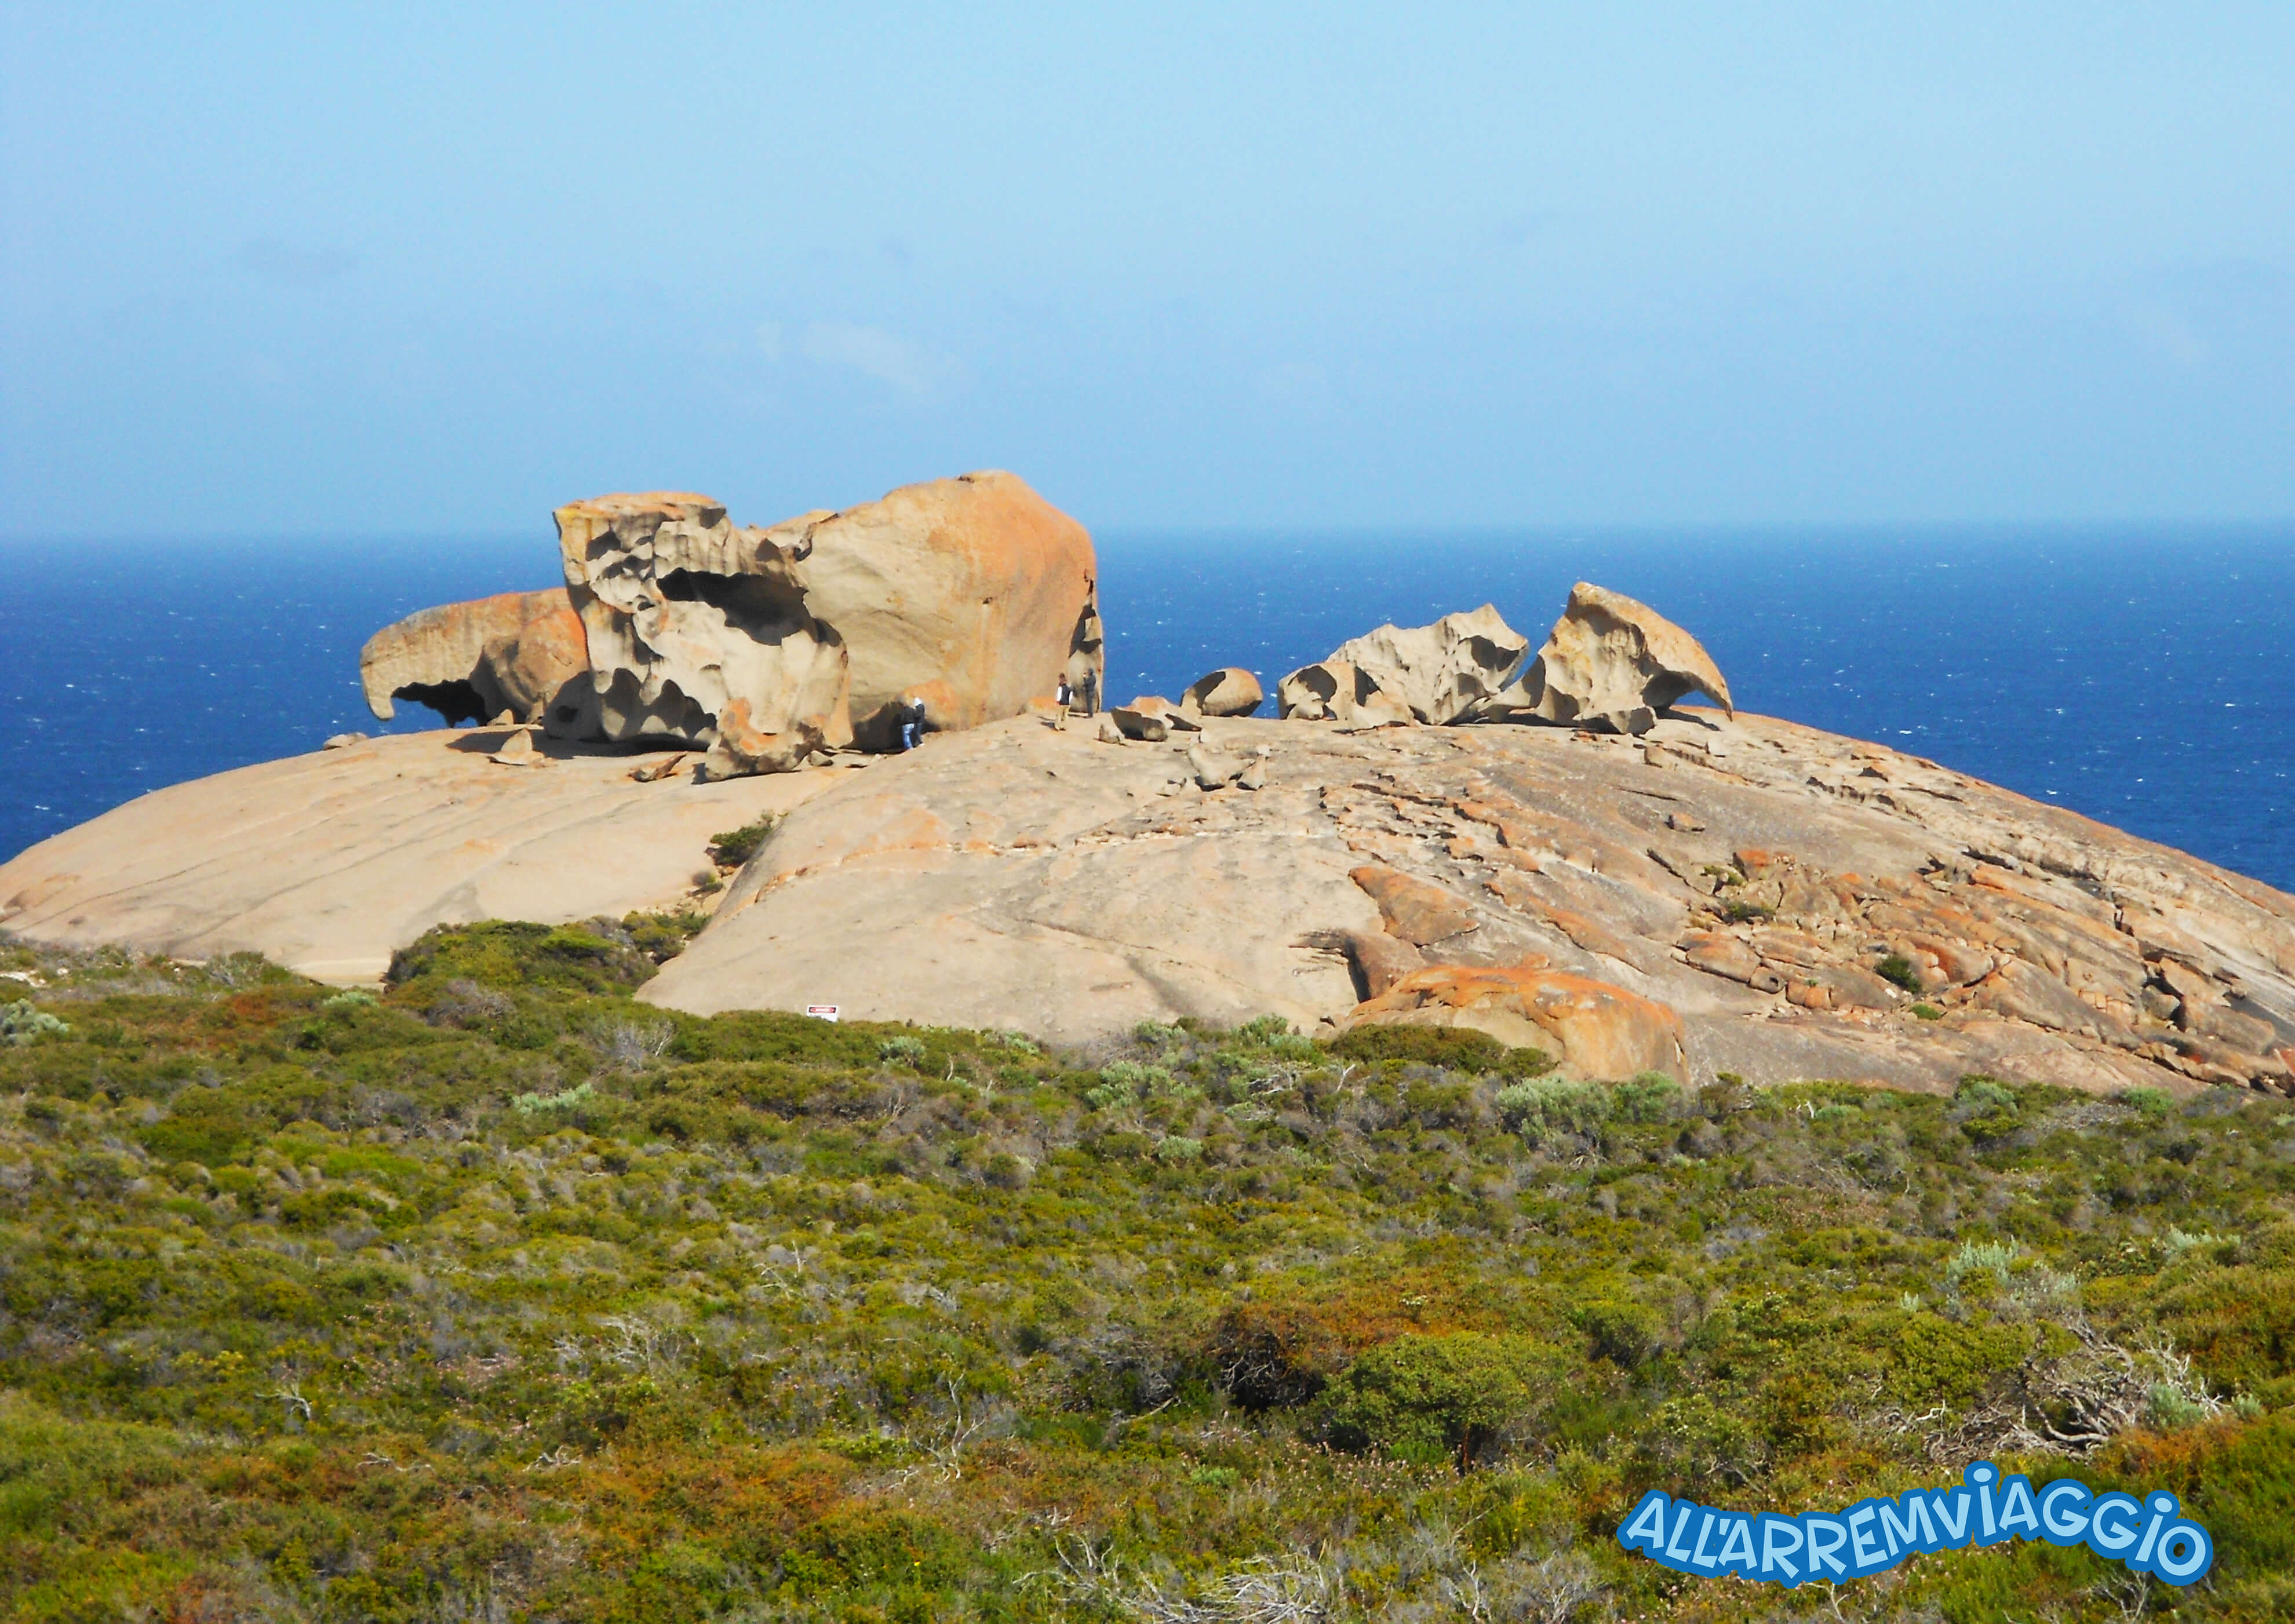 kKangaroo_island_cosa_vedere